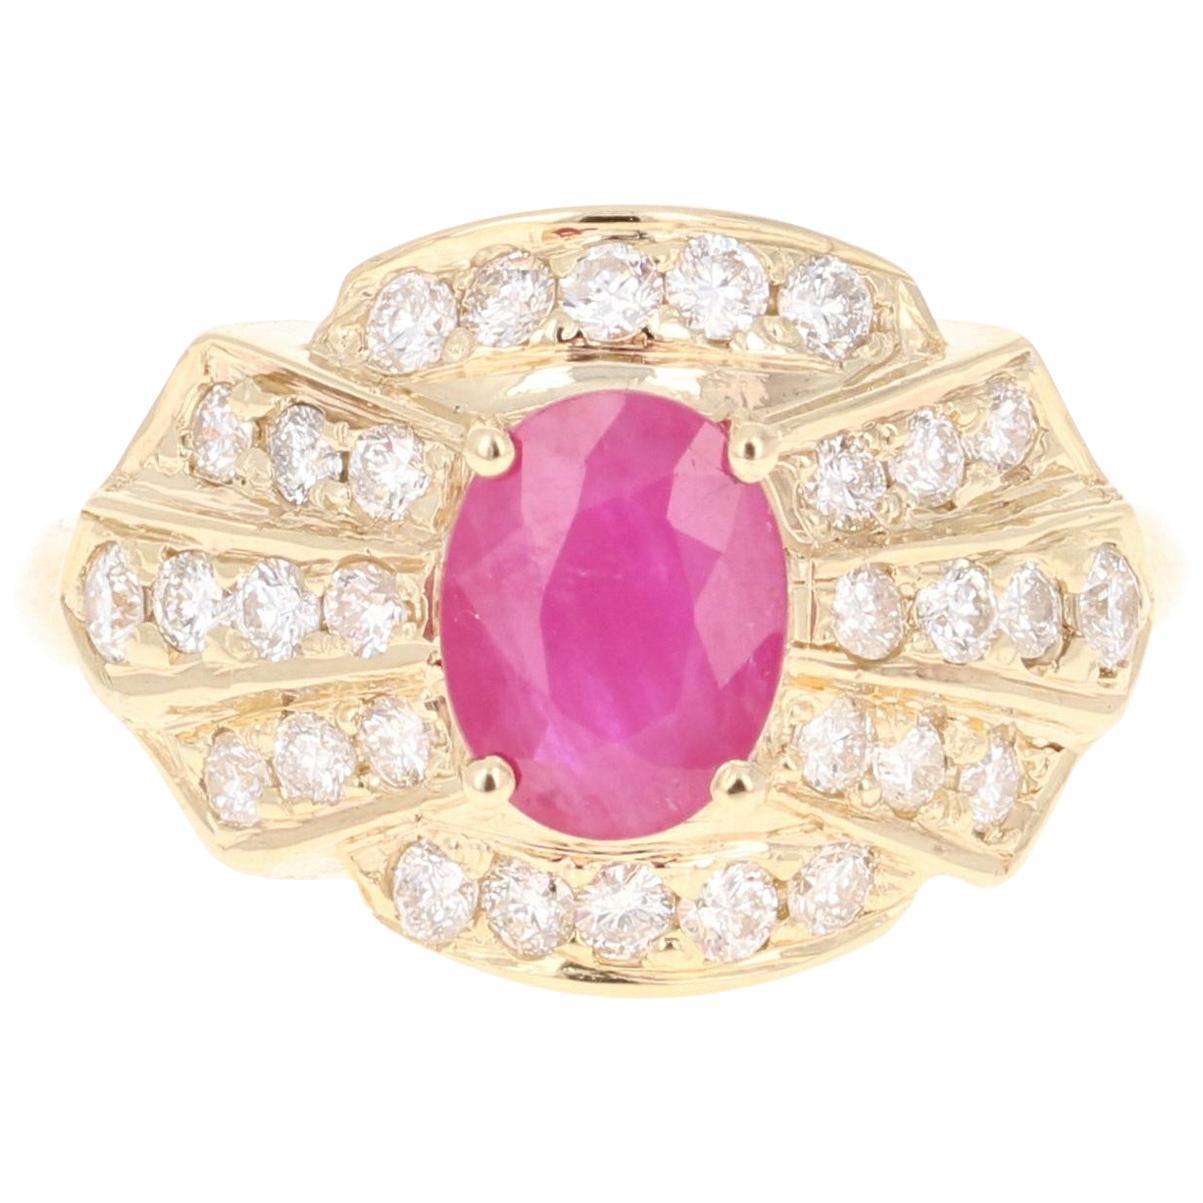 2.03 Carat Oval Cut Burmese Ruby Diamond 14 Karat Yellow Gold Ring